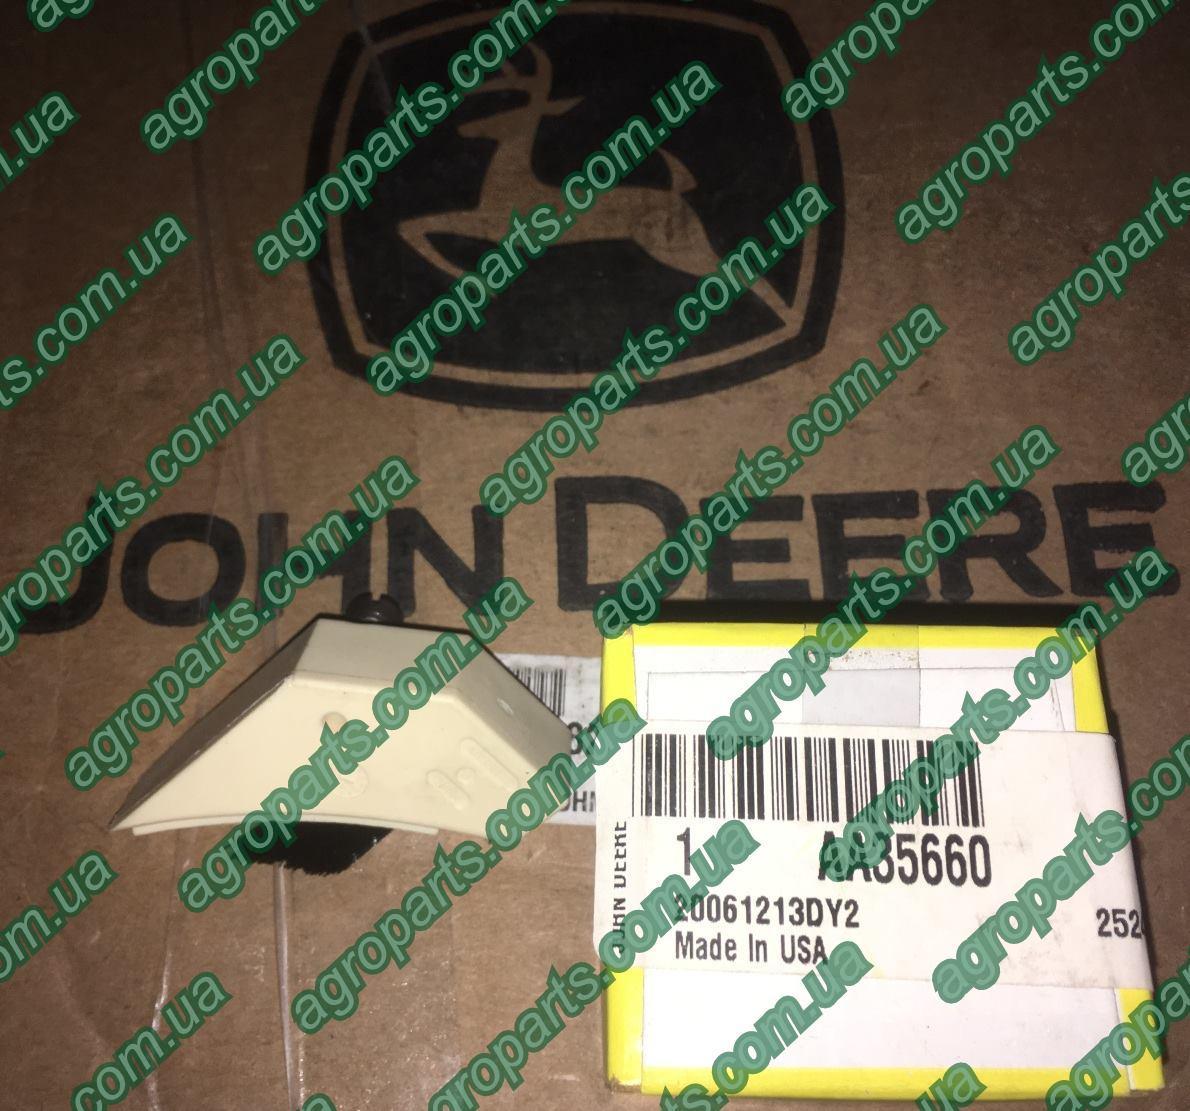 Щетка AA35660 John Deere Brush 343052 чистик семян ga2020 сбрасыватель AA38077